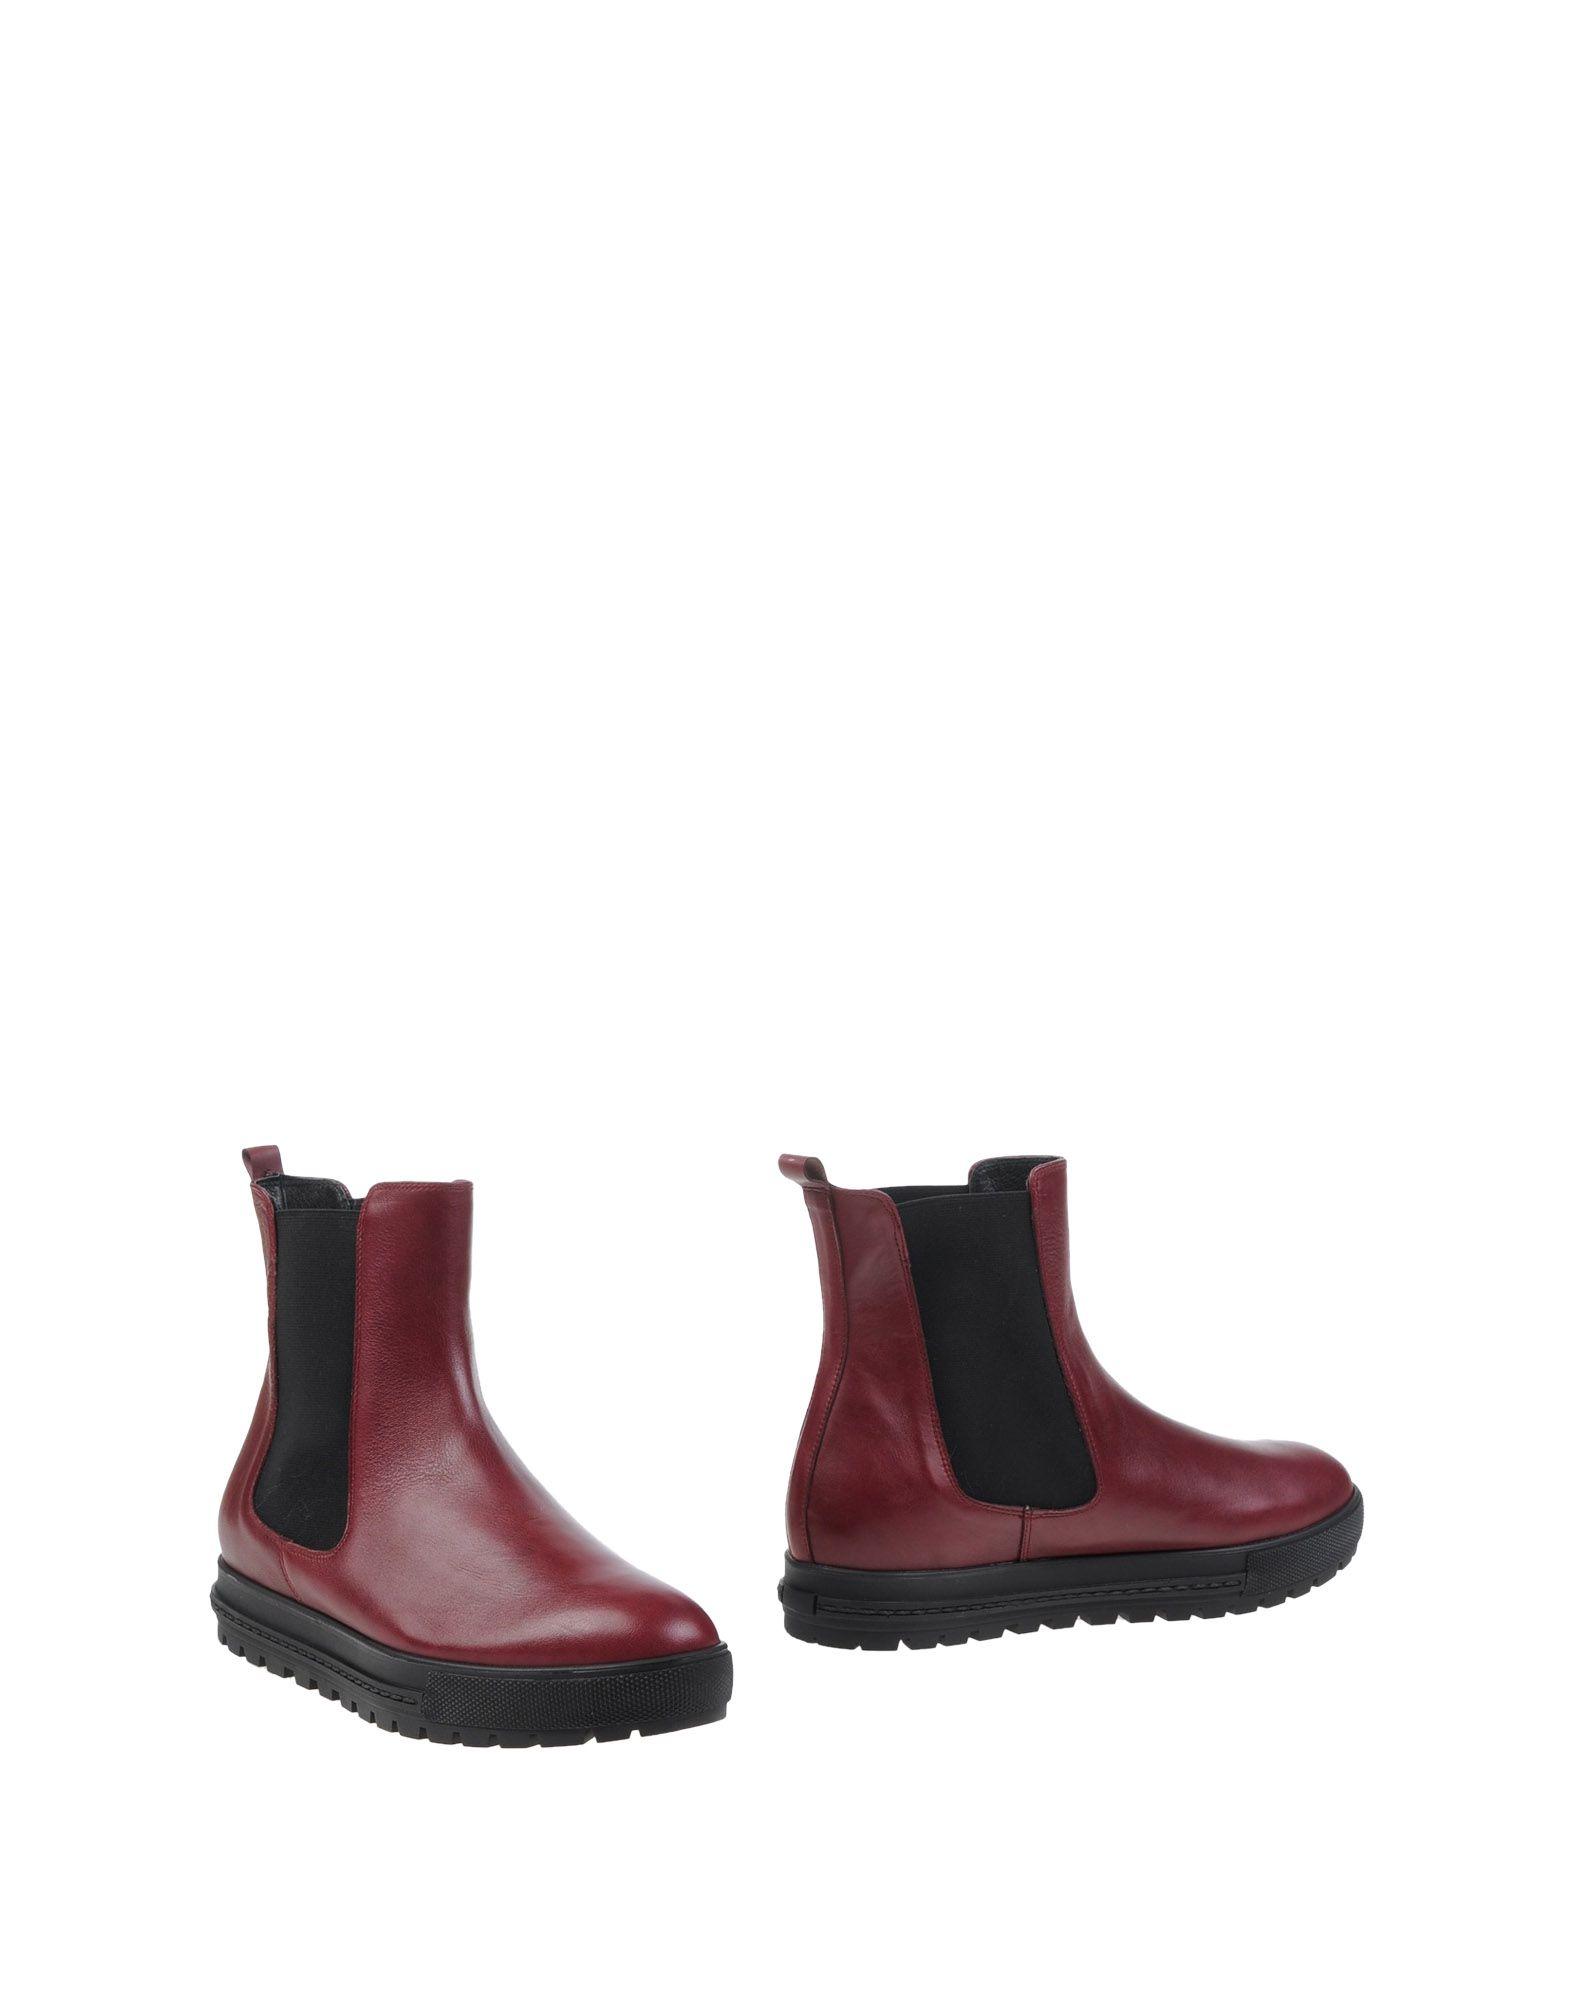 SI by SINELA Полусапоги и высокие ботинки si by sinela полусапоги и высокие ботинки